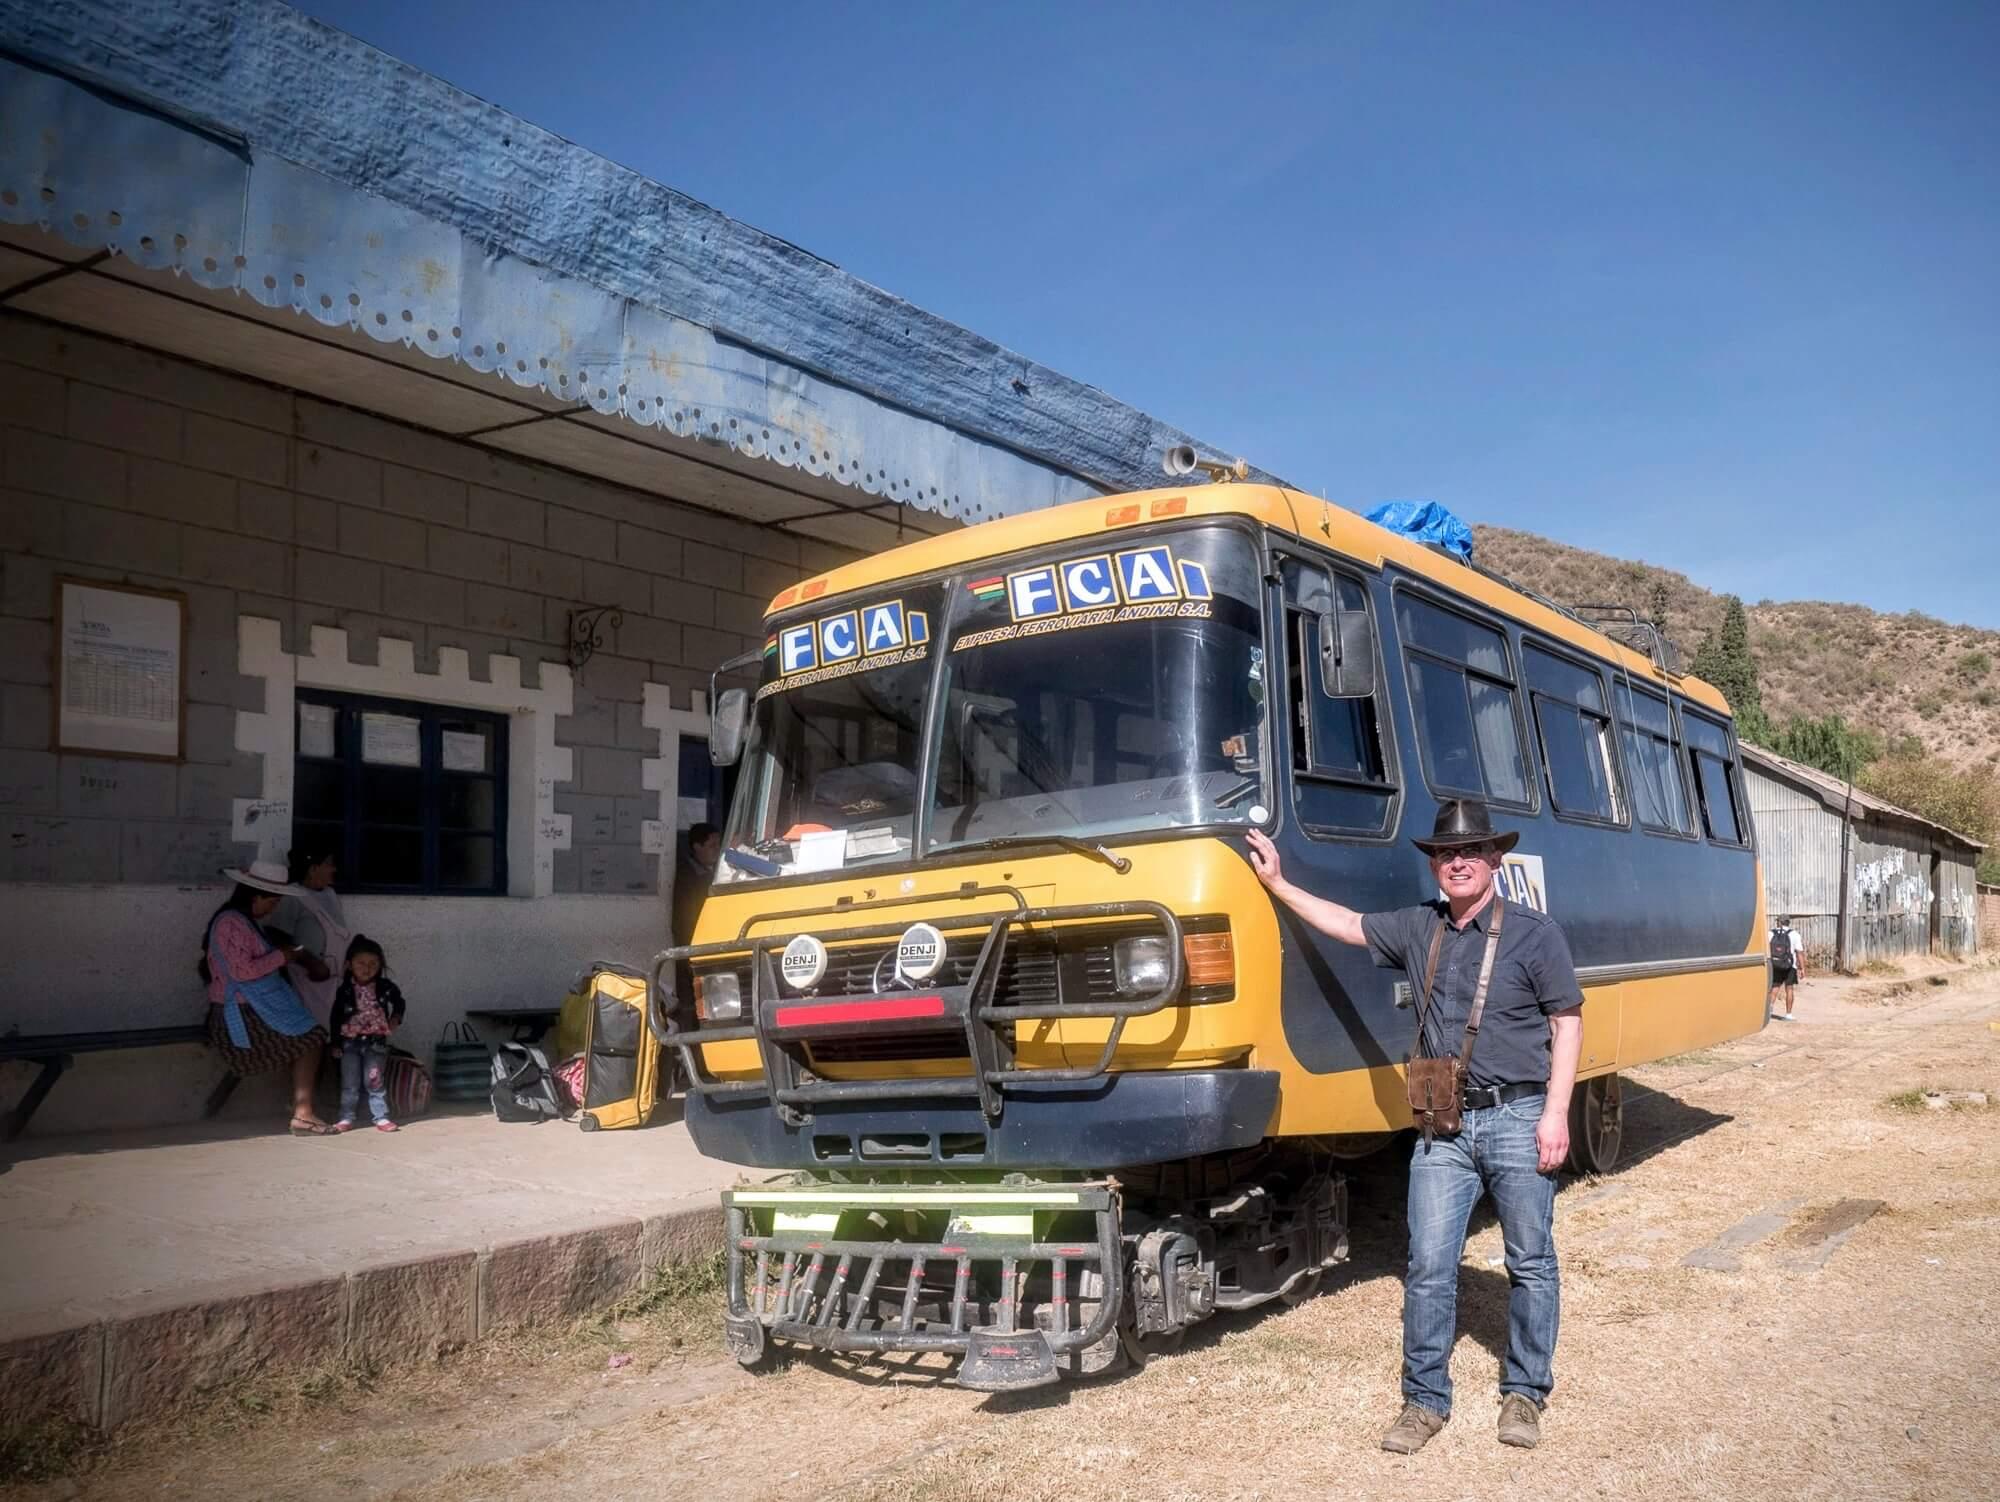 Ferrobus at the El Tejar Station near Sucre /Bolivia